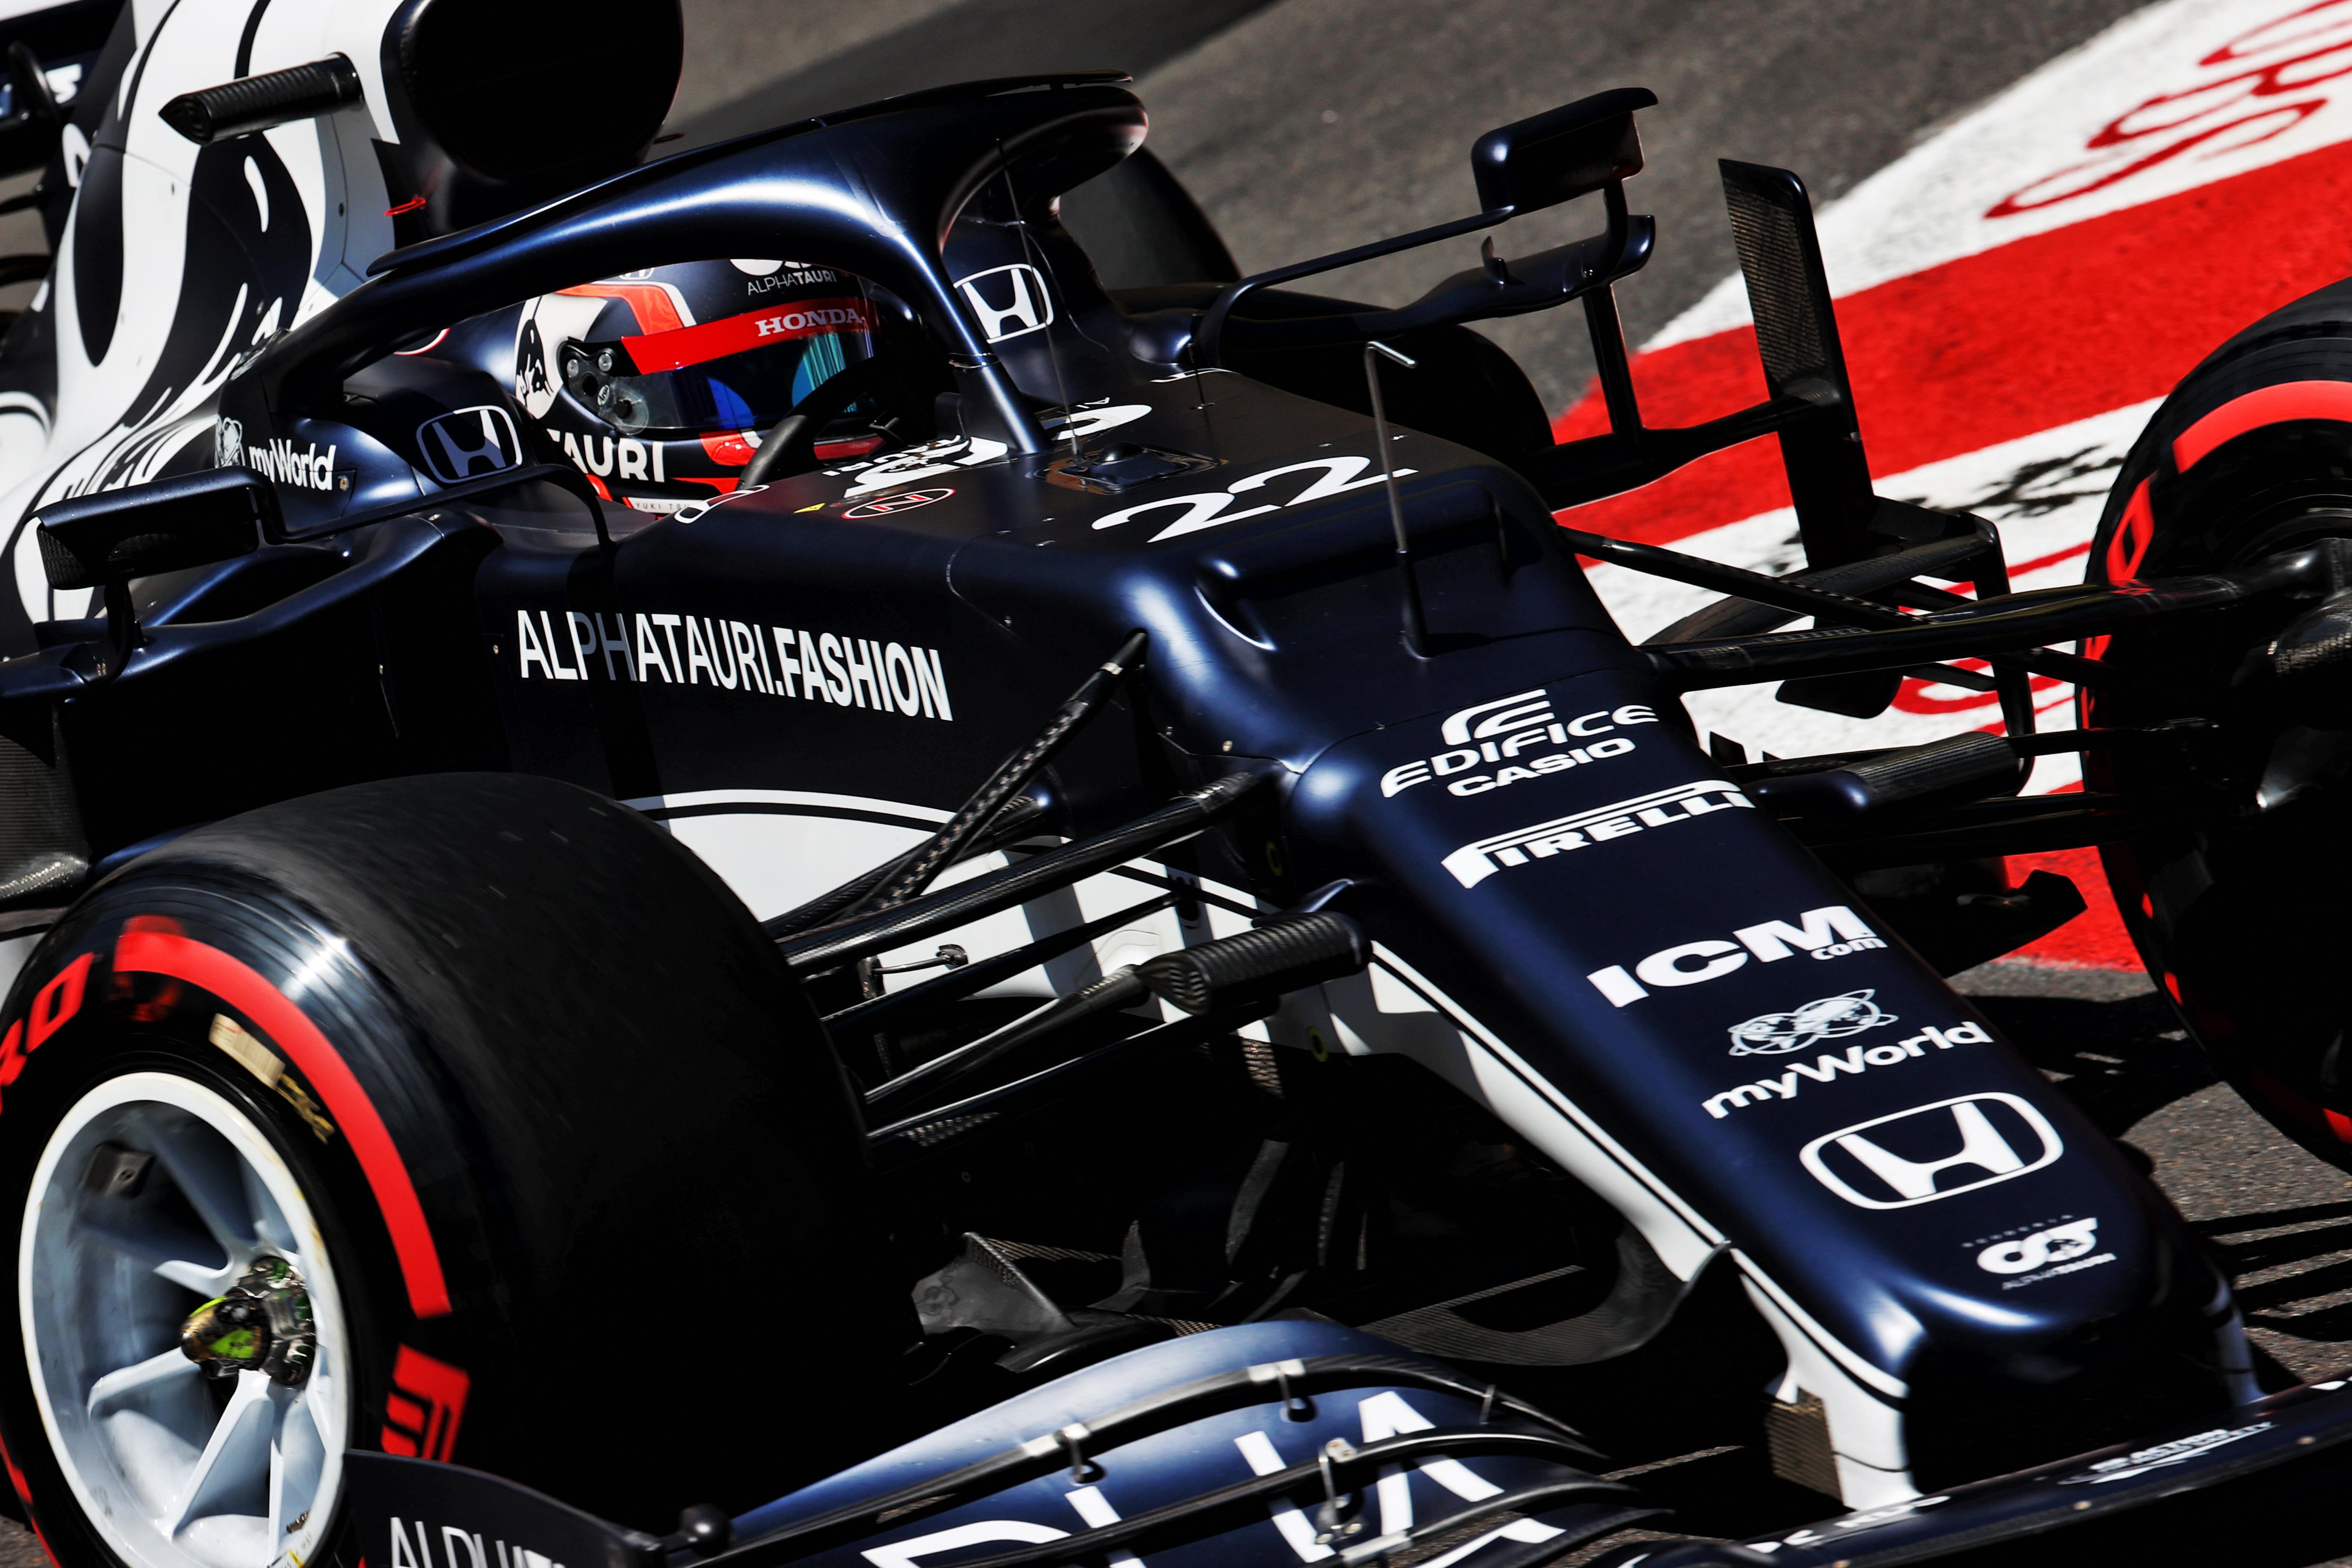 Yuki Tsunoda AlphaTauri Monaco Grand Prix 2021